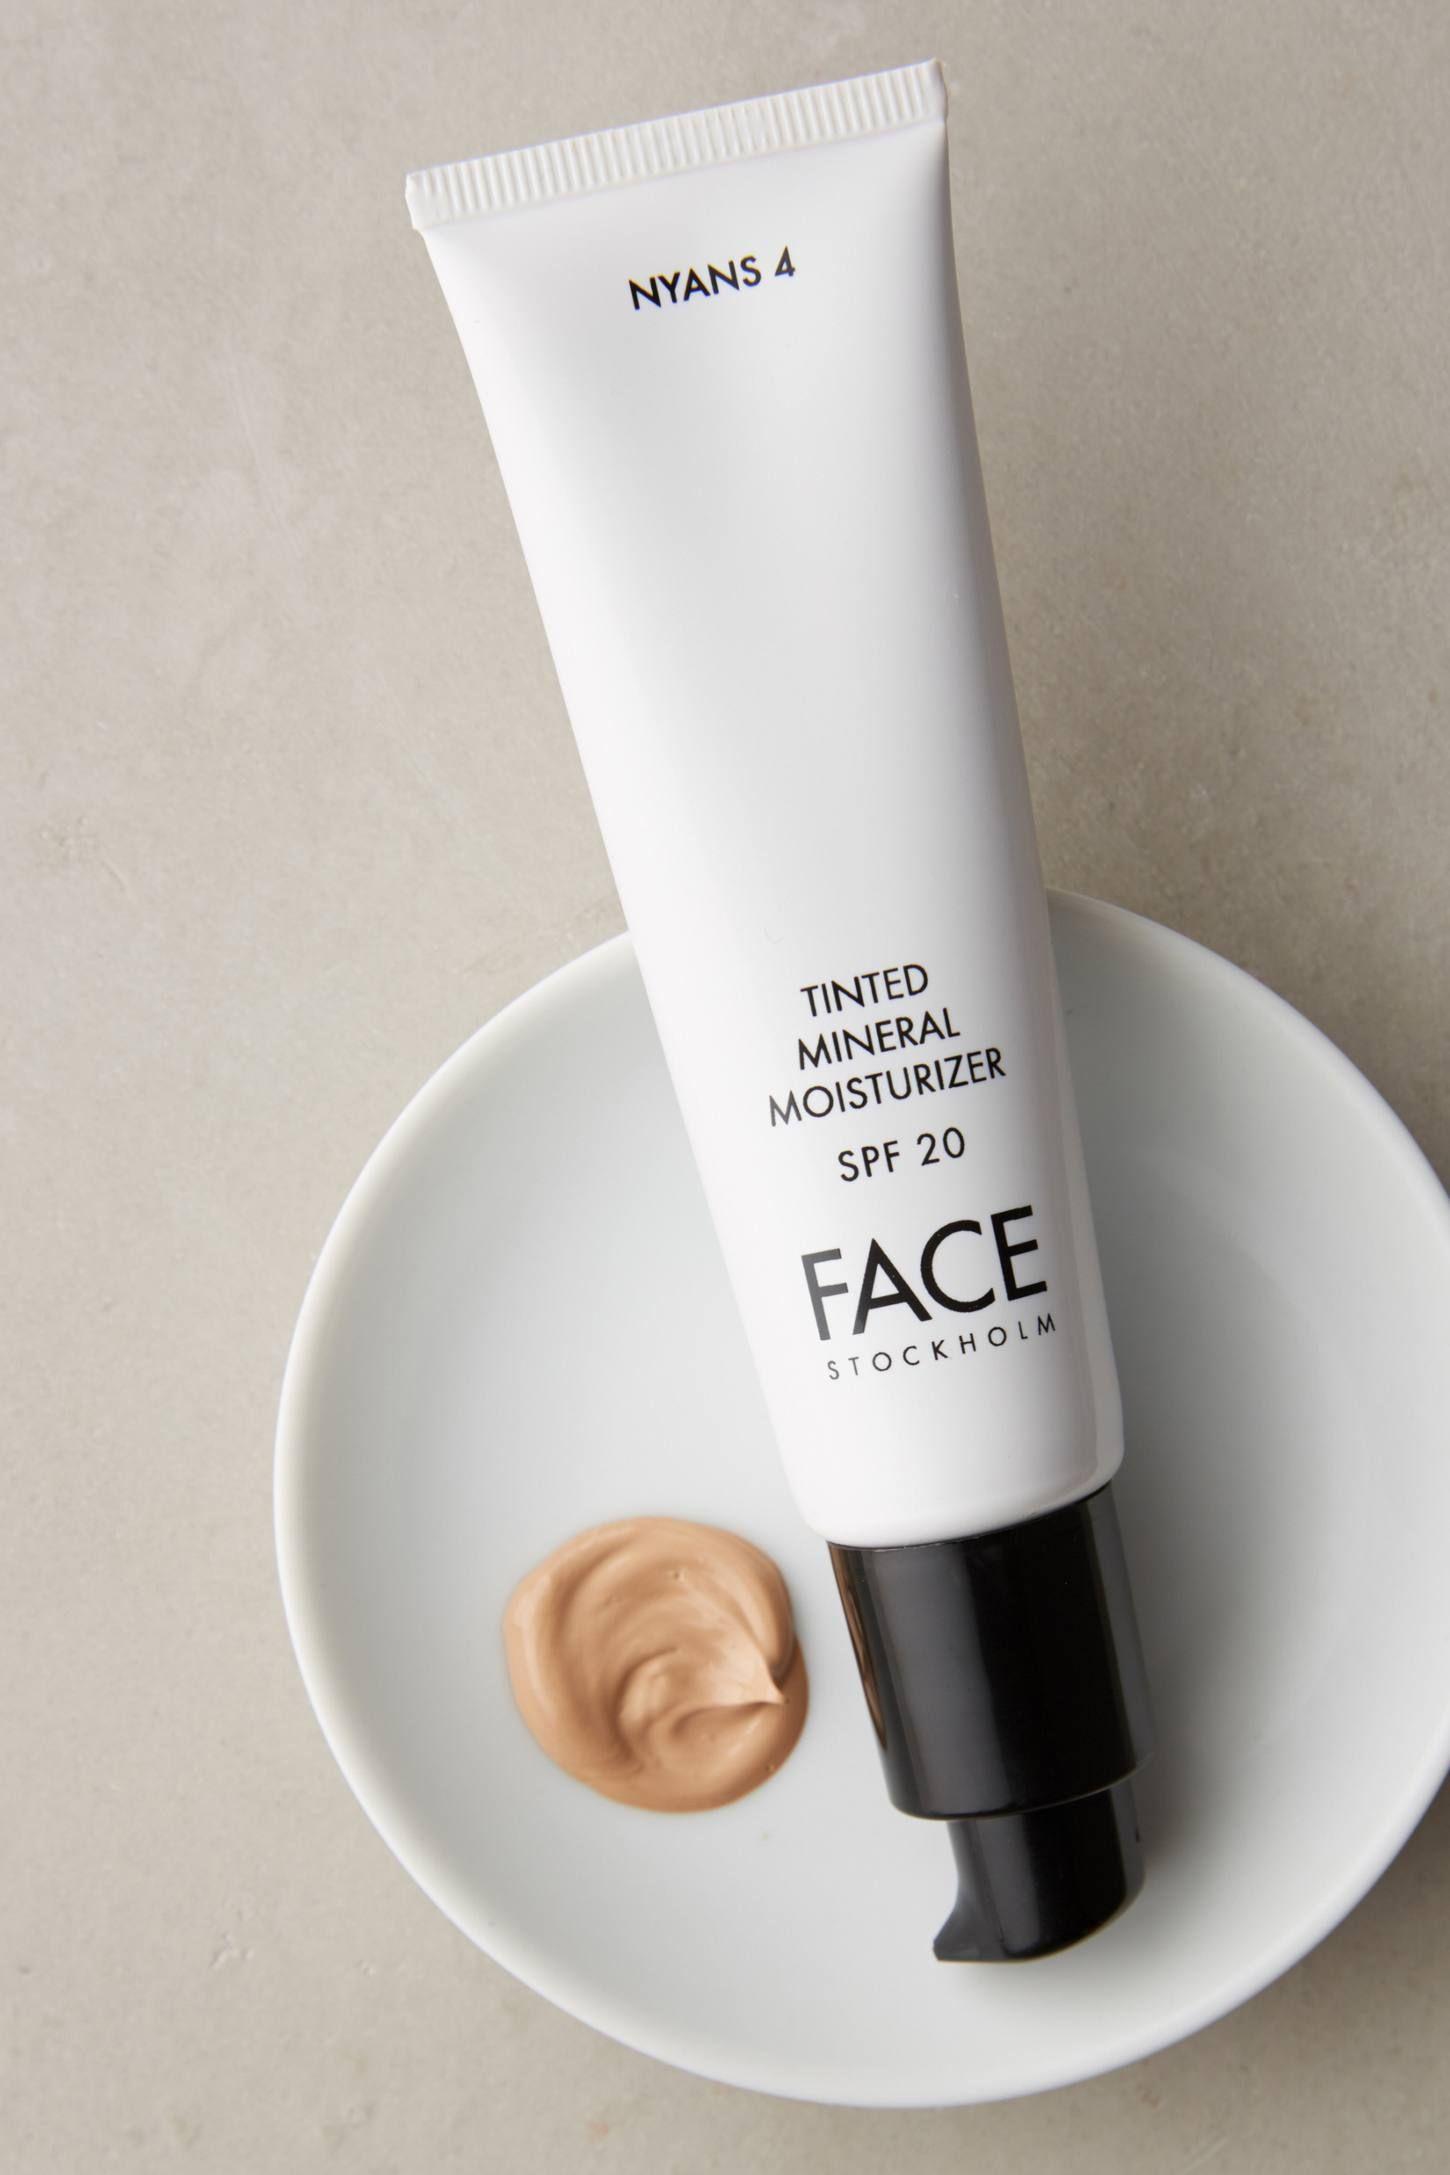 face 2 face stockholm